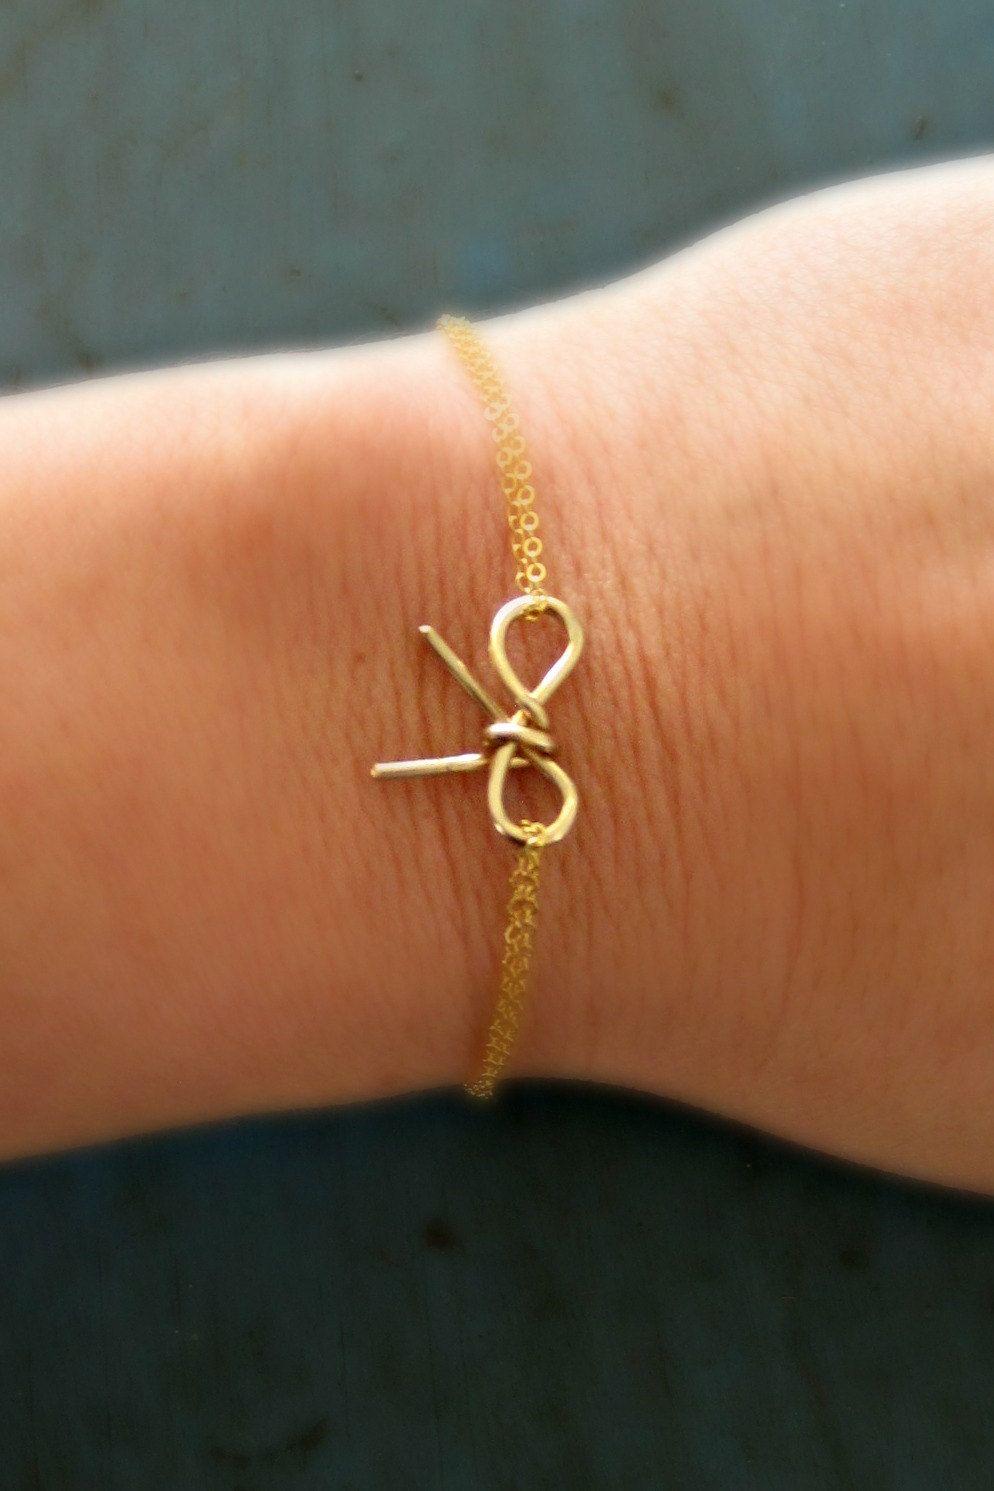 Gold Bow Bracelet Simple Minimalist Jewelry bridesmaid gifts. $19.50, via Etsy.